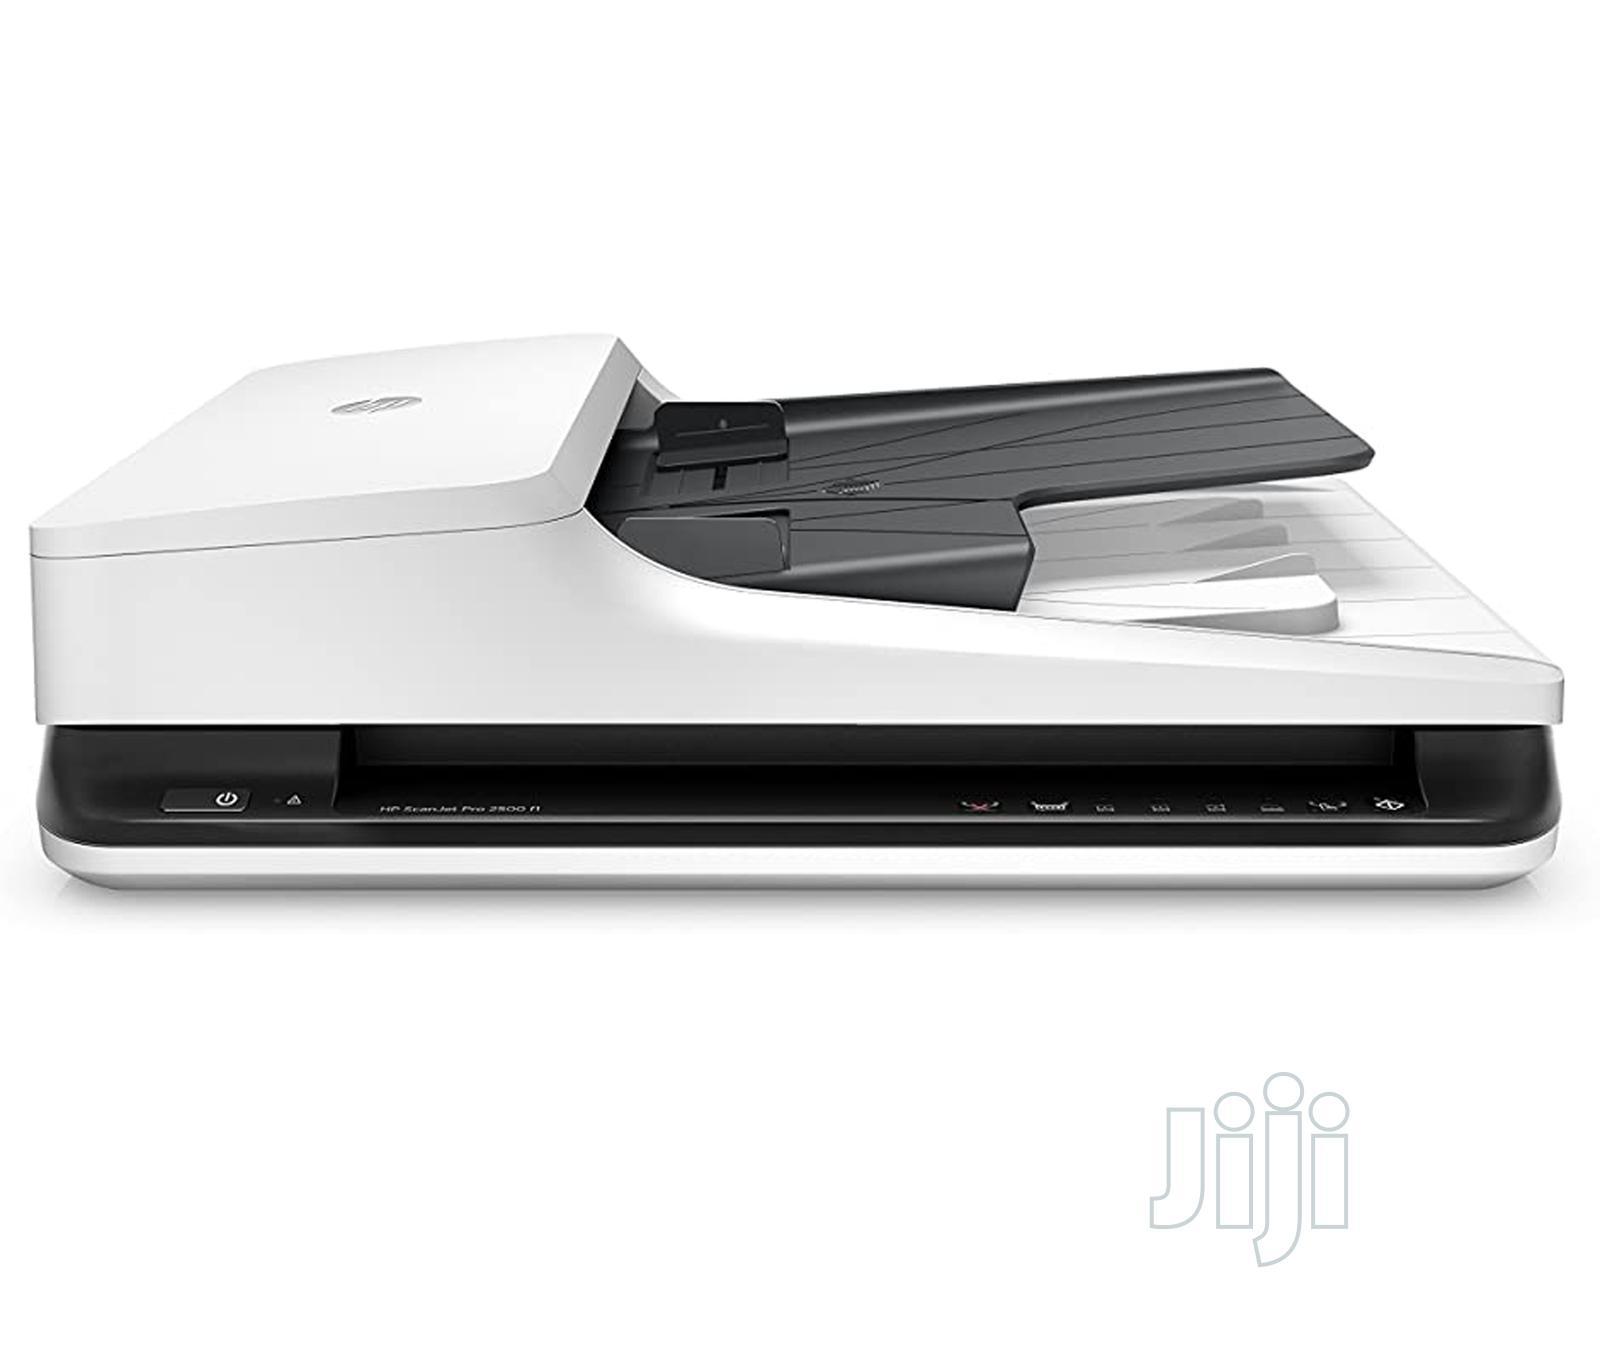 Hp Scanjet Pro 2500 F1 | Printers & Scanners for sale in Lagos Island (Eko), Lagos State, Nigeria